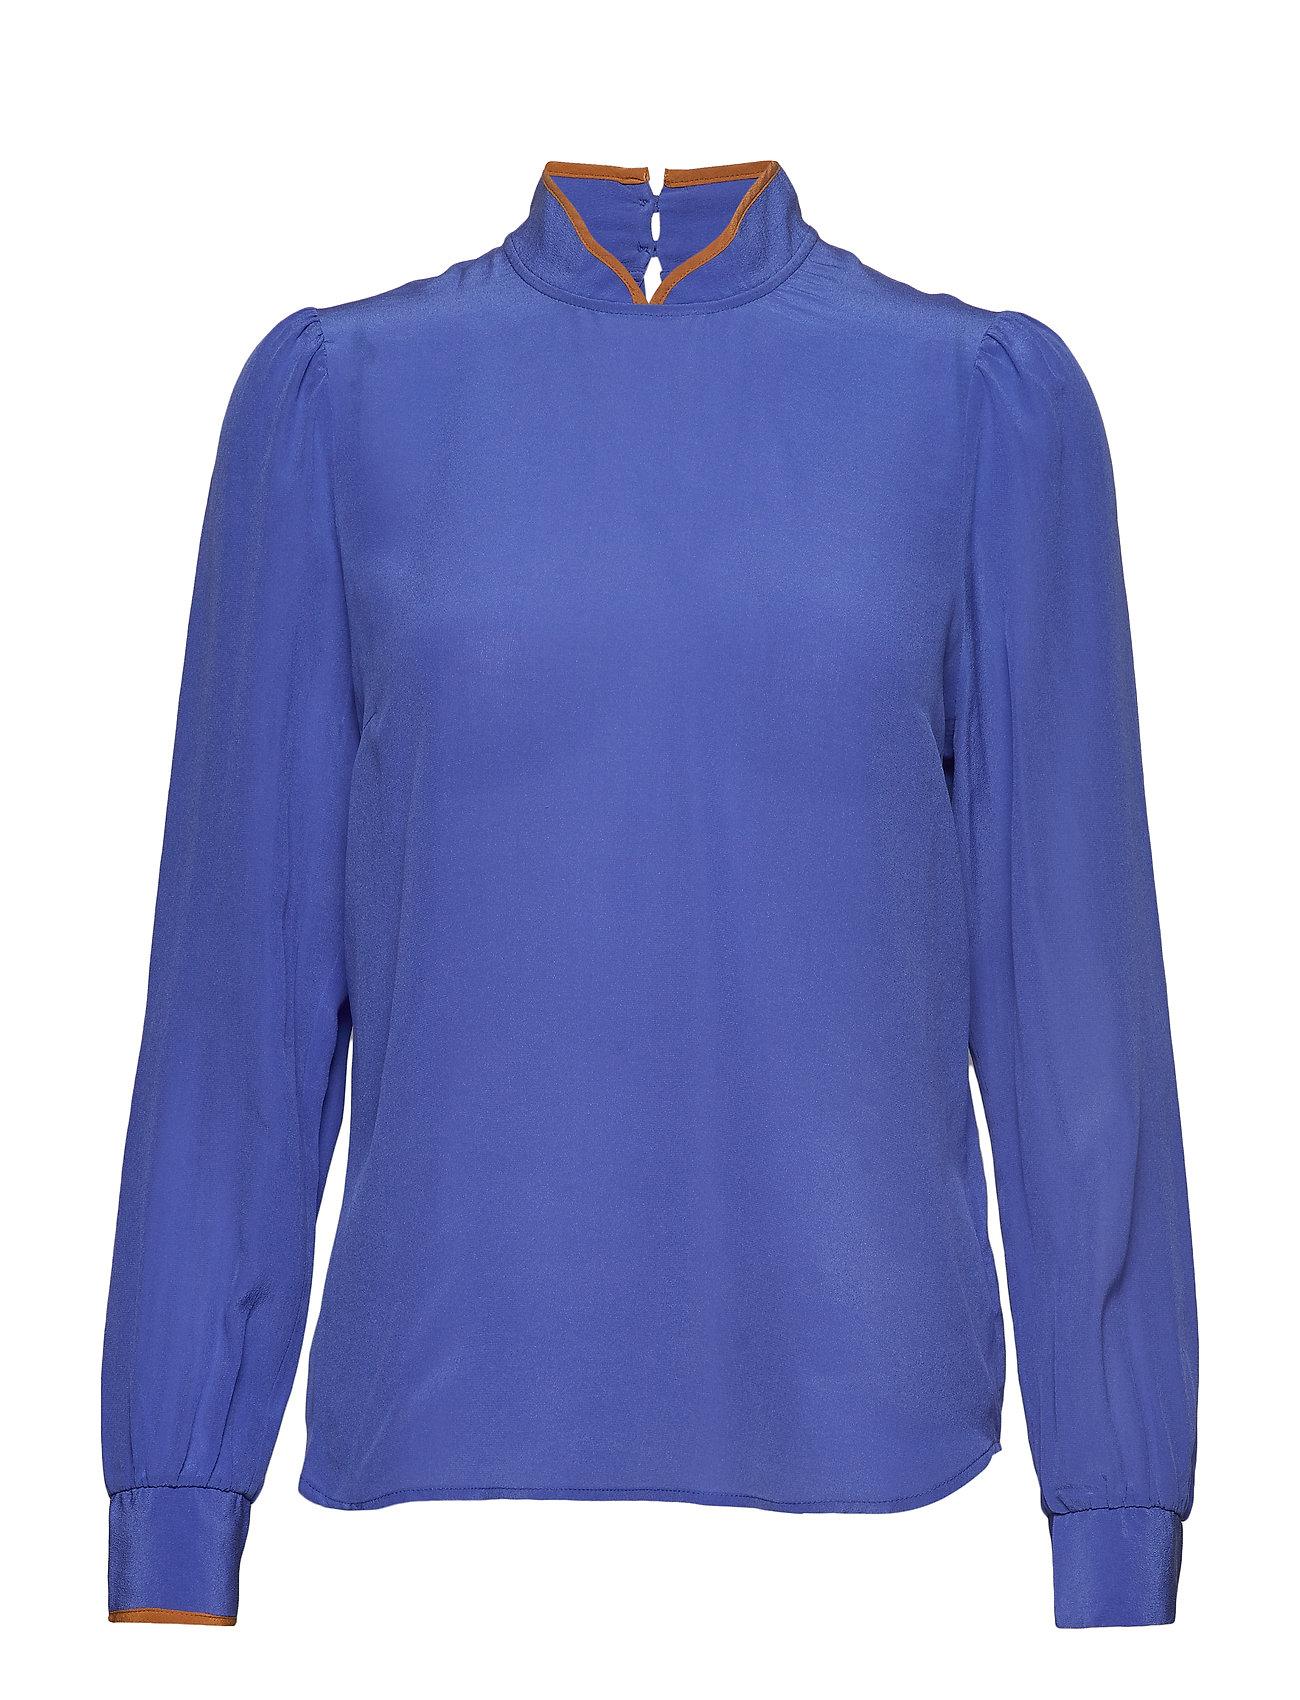 Custommade Afi - ROYAL BLUE